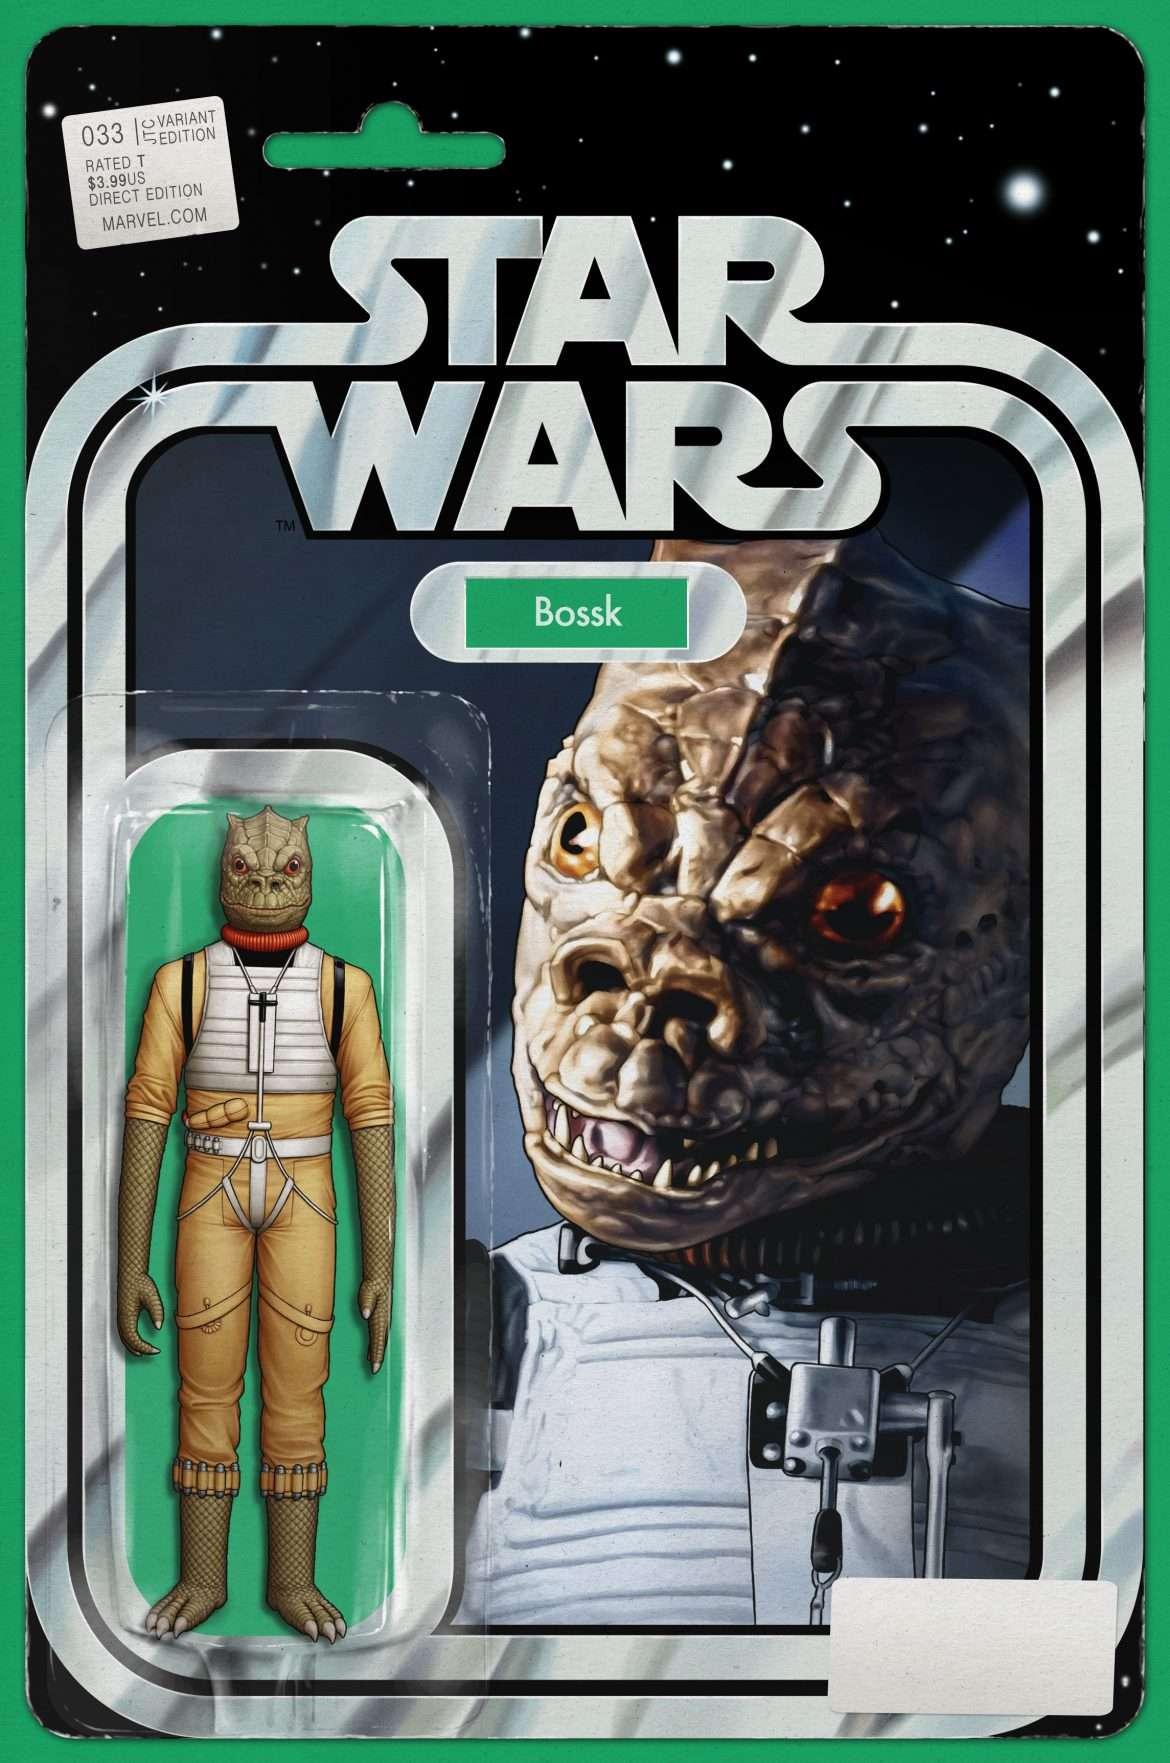 Star Wars #33 Bossk